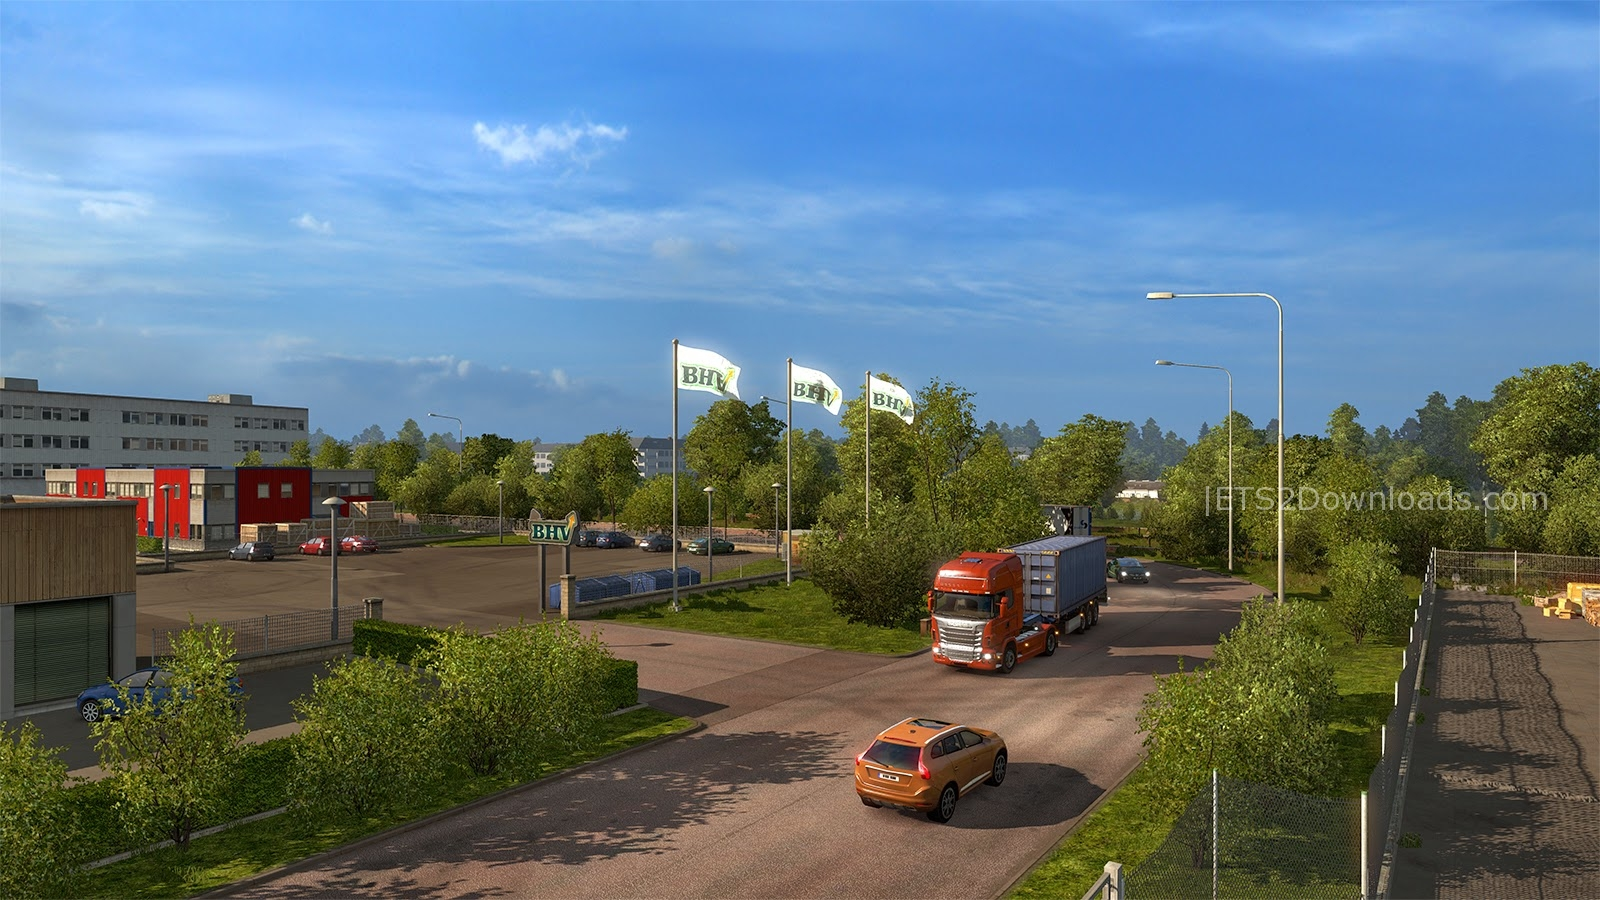 orebro-new-city-in-scandinavia-dlc-2